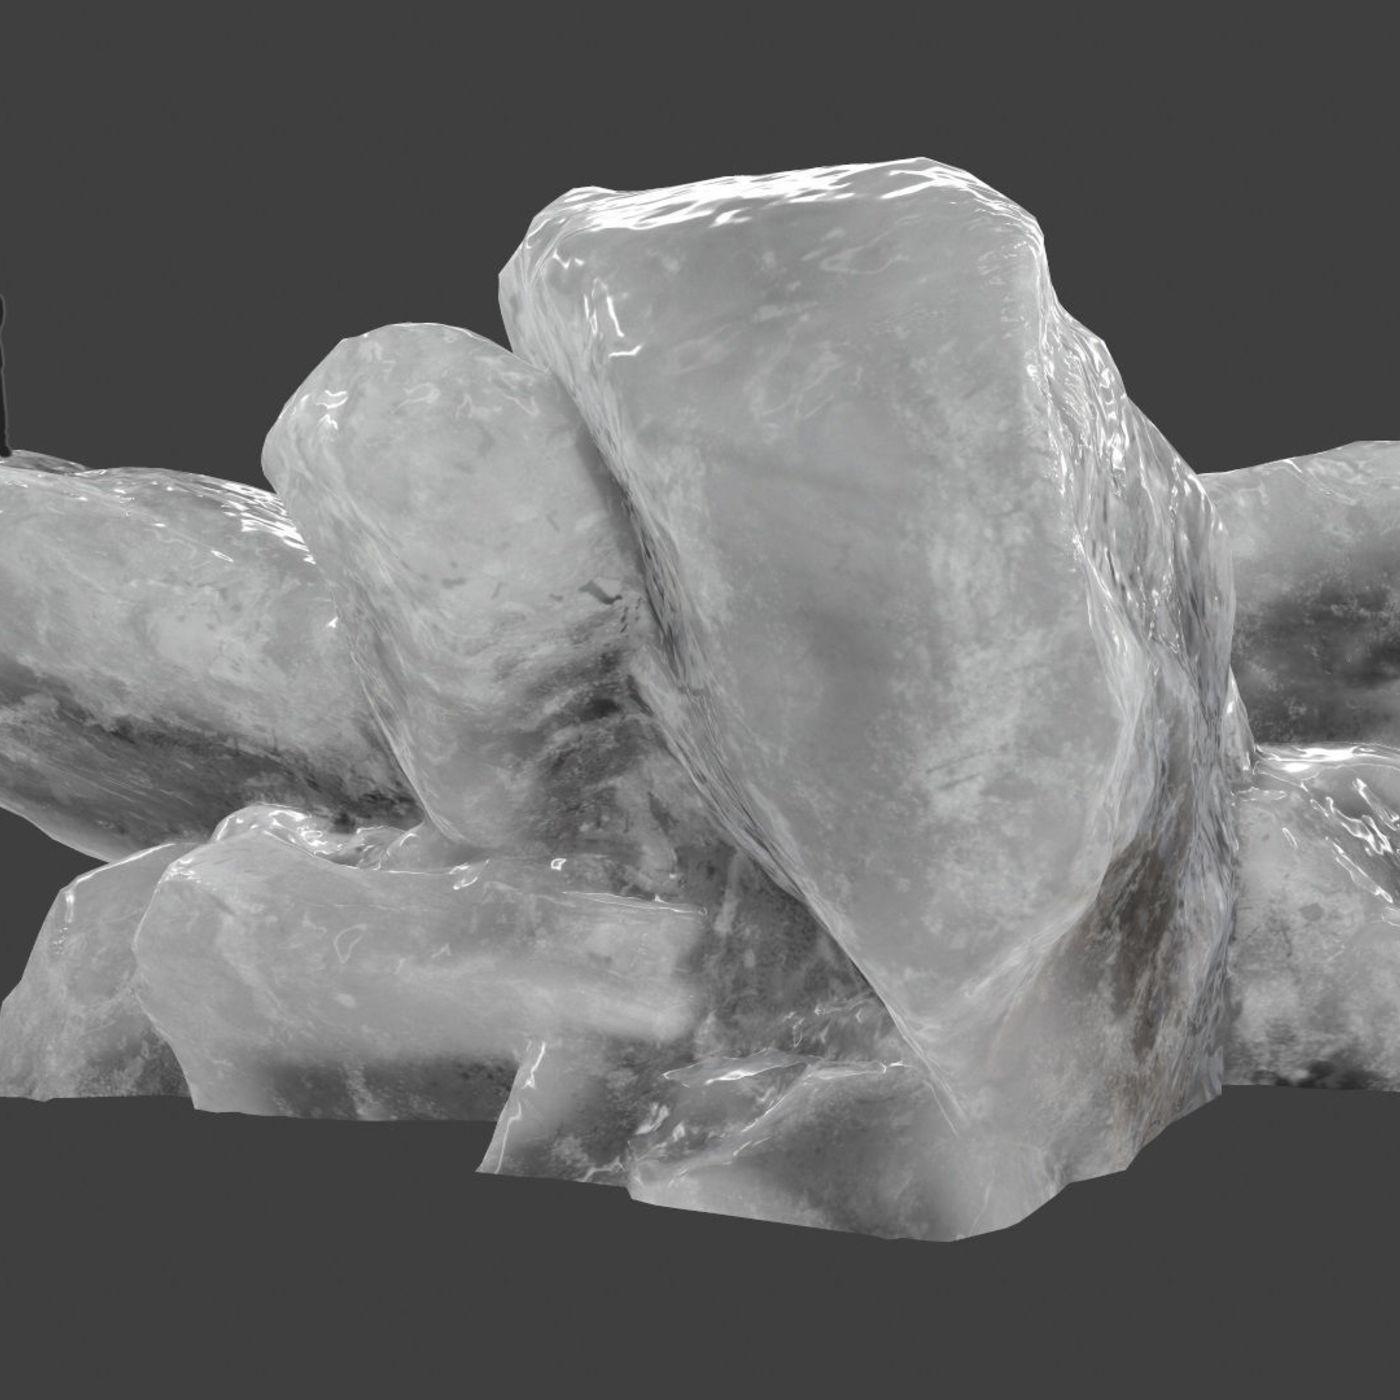 snow ice rocks